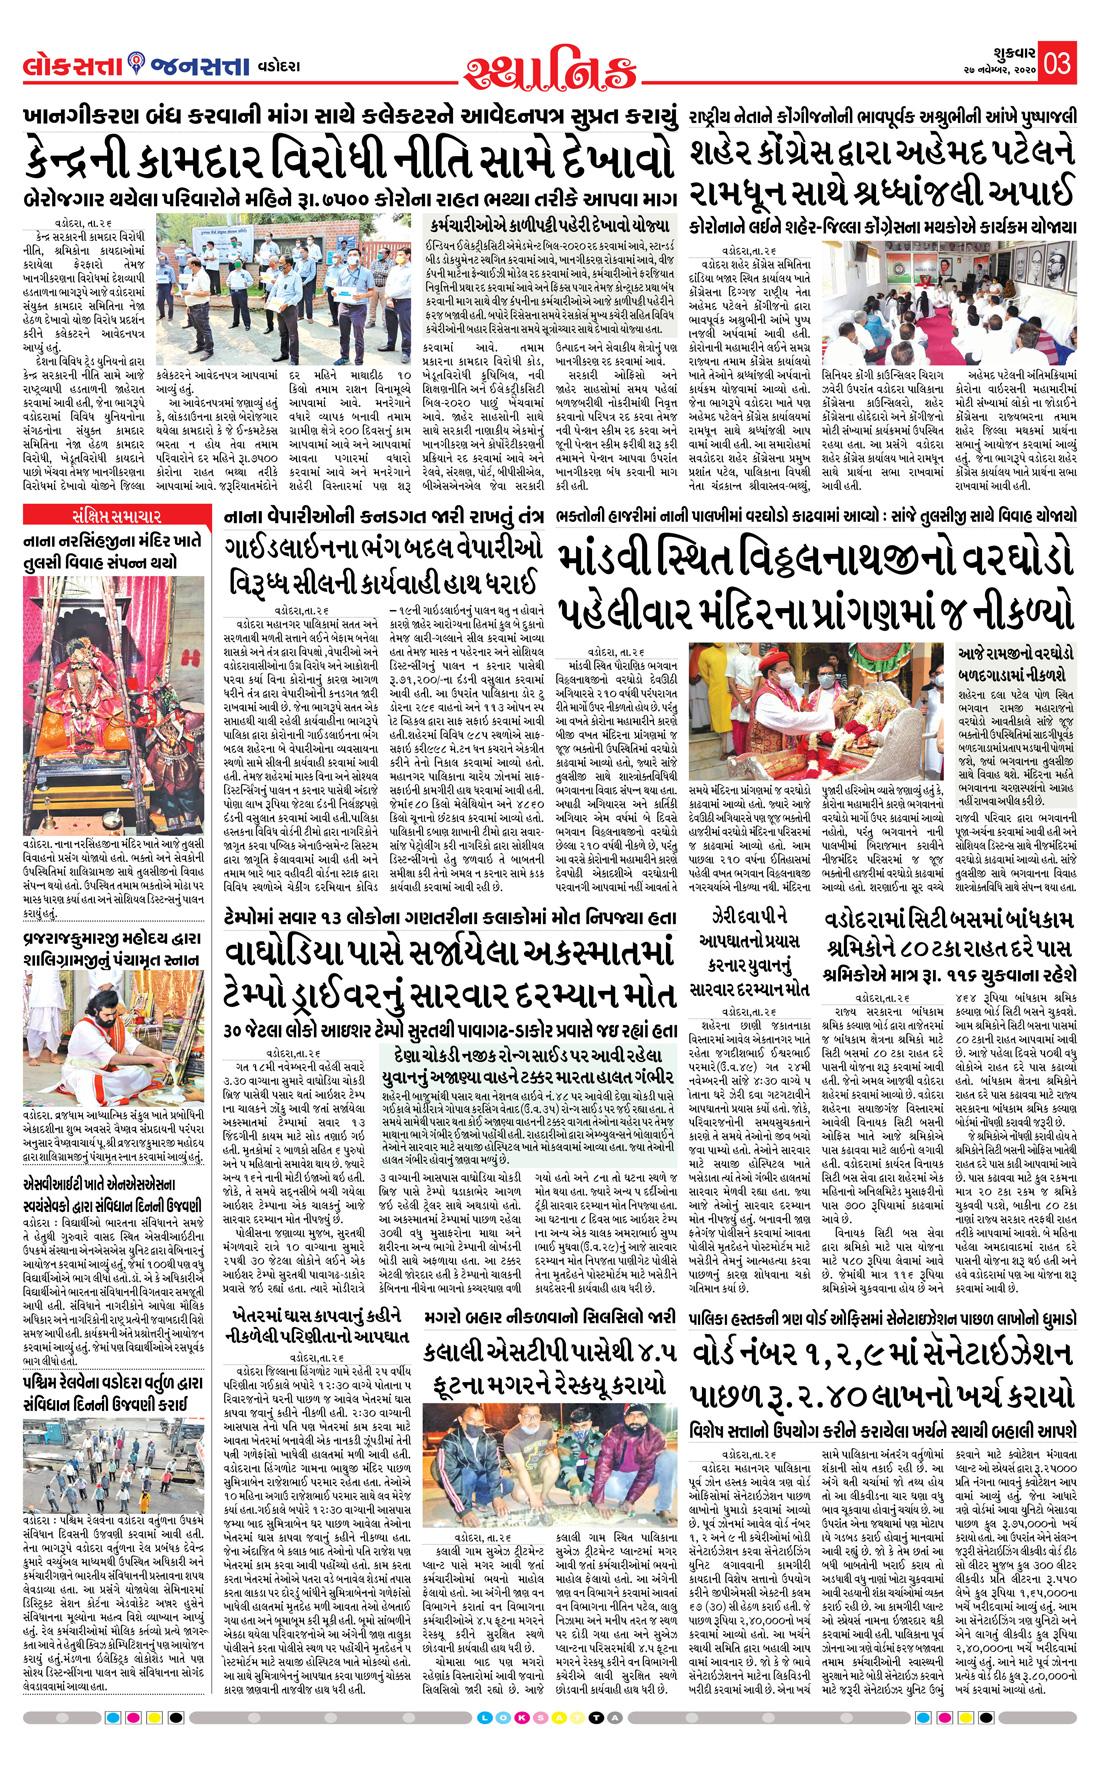 Loksatta Jansatta News Papaer E-paper dated 2020-11-27 | Page 4